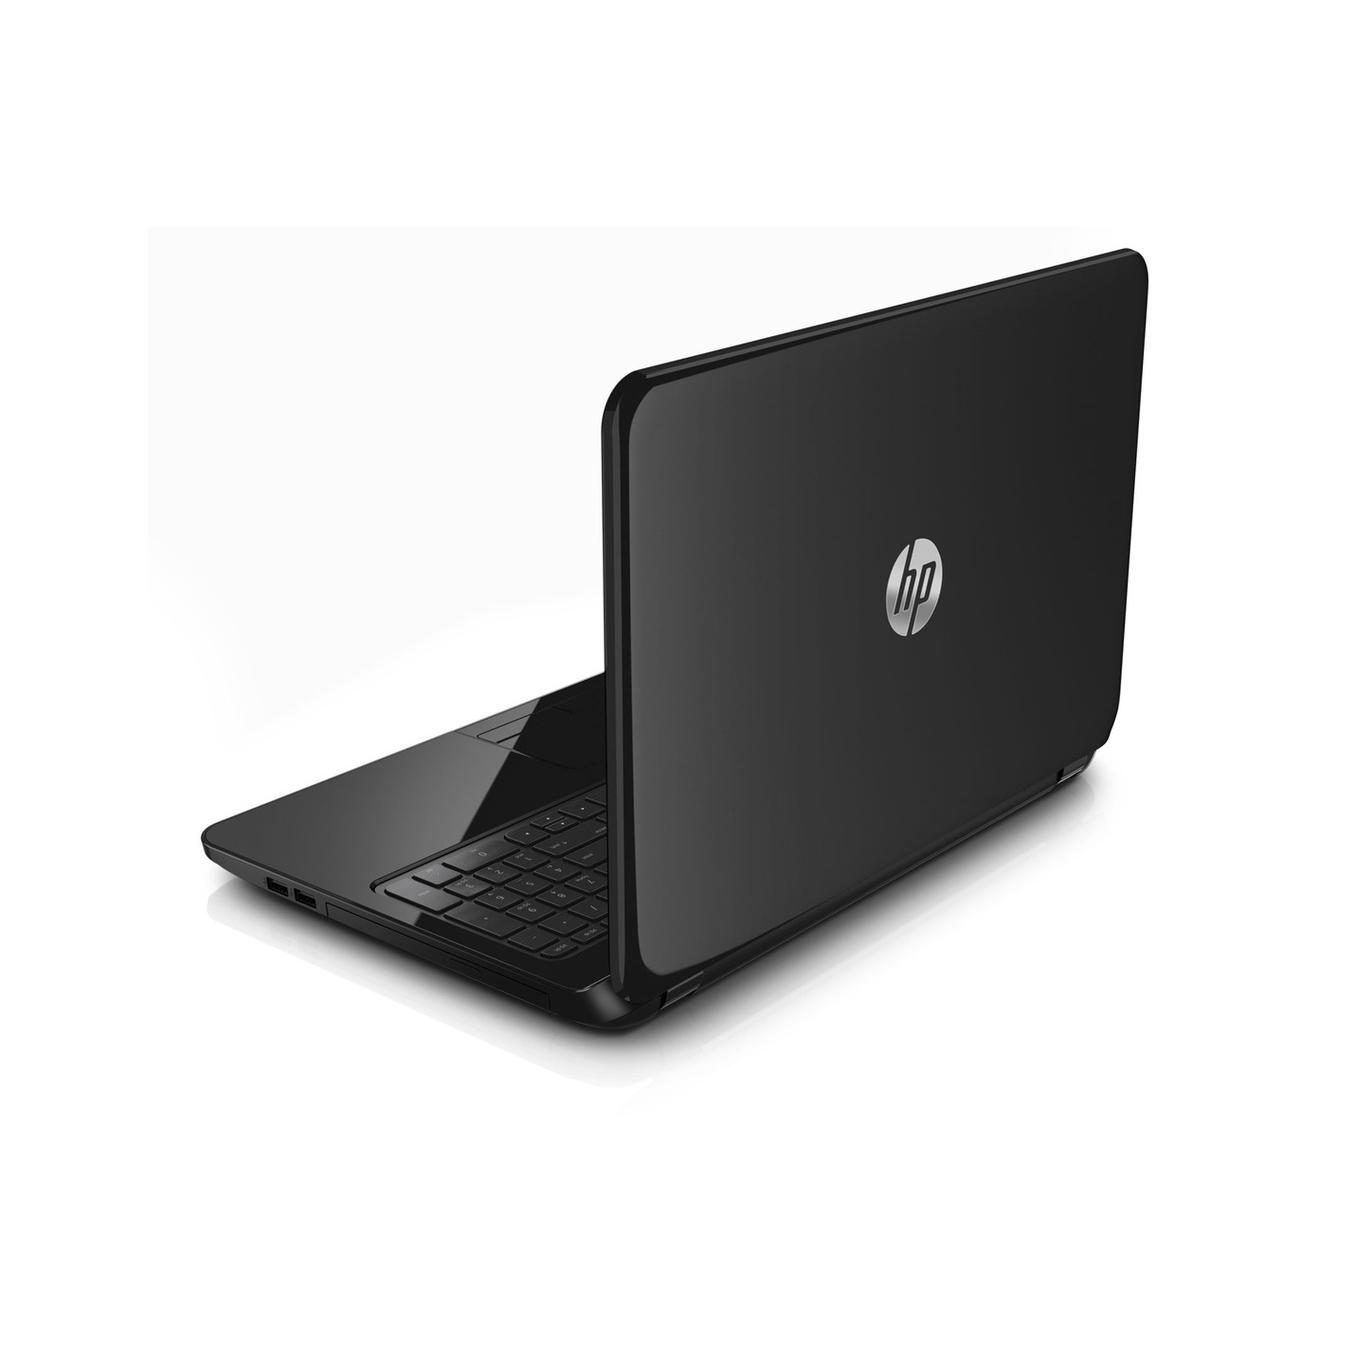 "HP 15-R134NF 15"" Core i3 1,7 GHz - HDD 500 GB - 4GB AZERTY - Französisch"